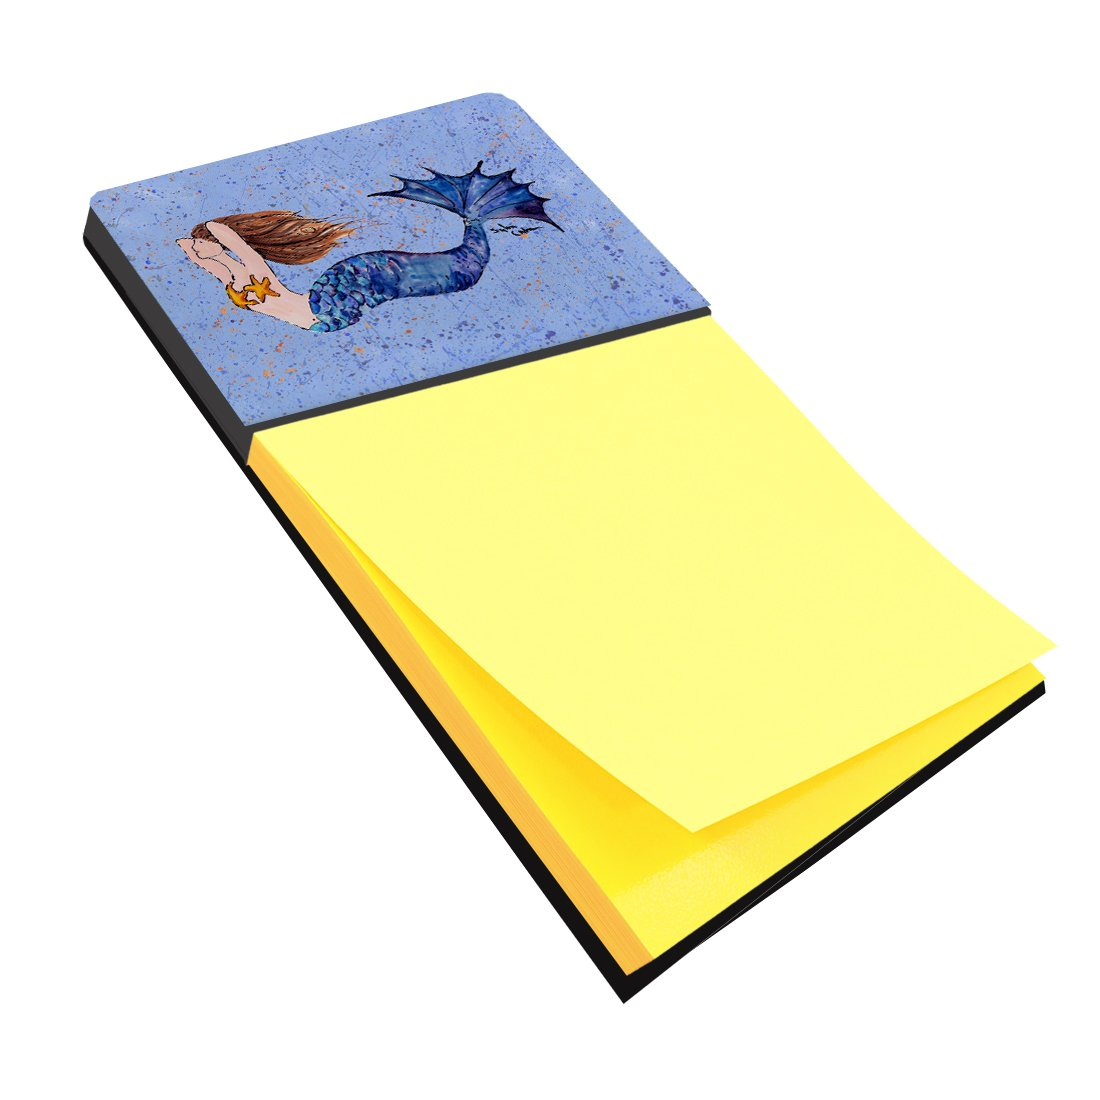 Caroline's Treasures 8337SN Mermaid Refiillable Sticky Note Holder or Postit Note Dispenser, Large, Multicolor